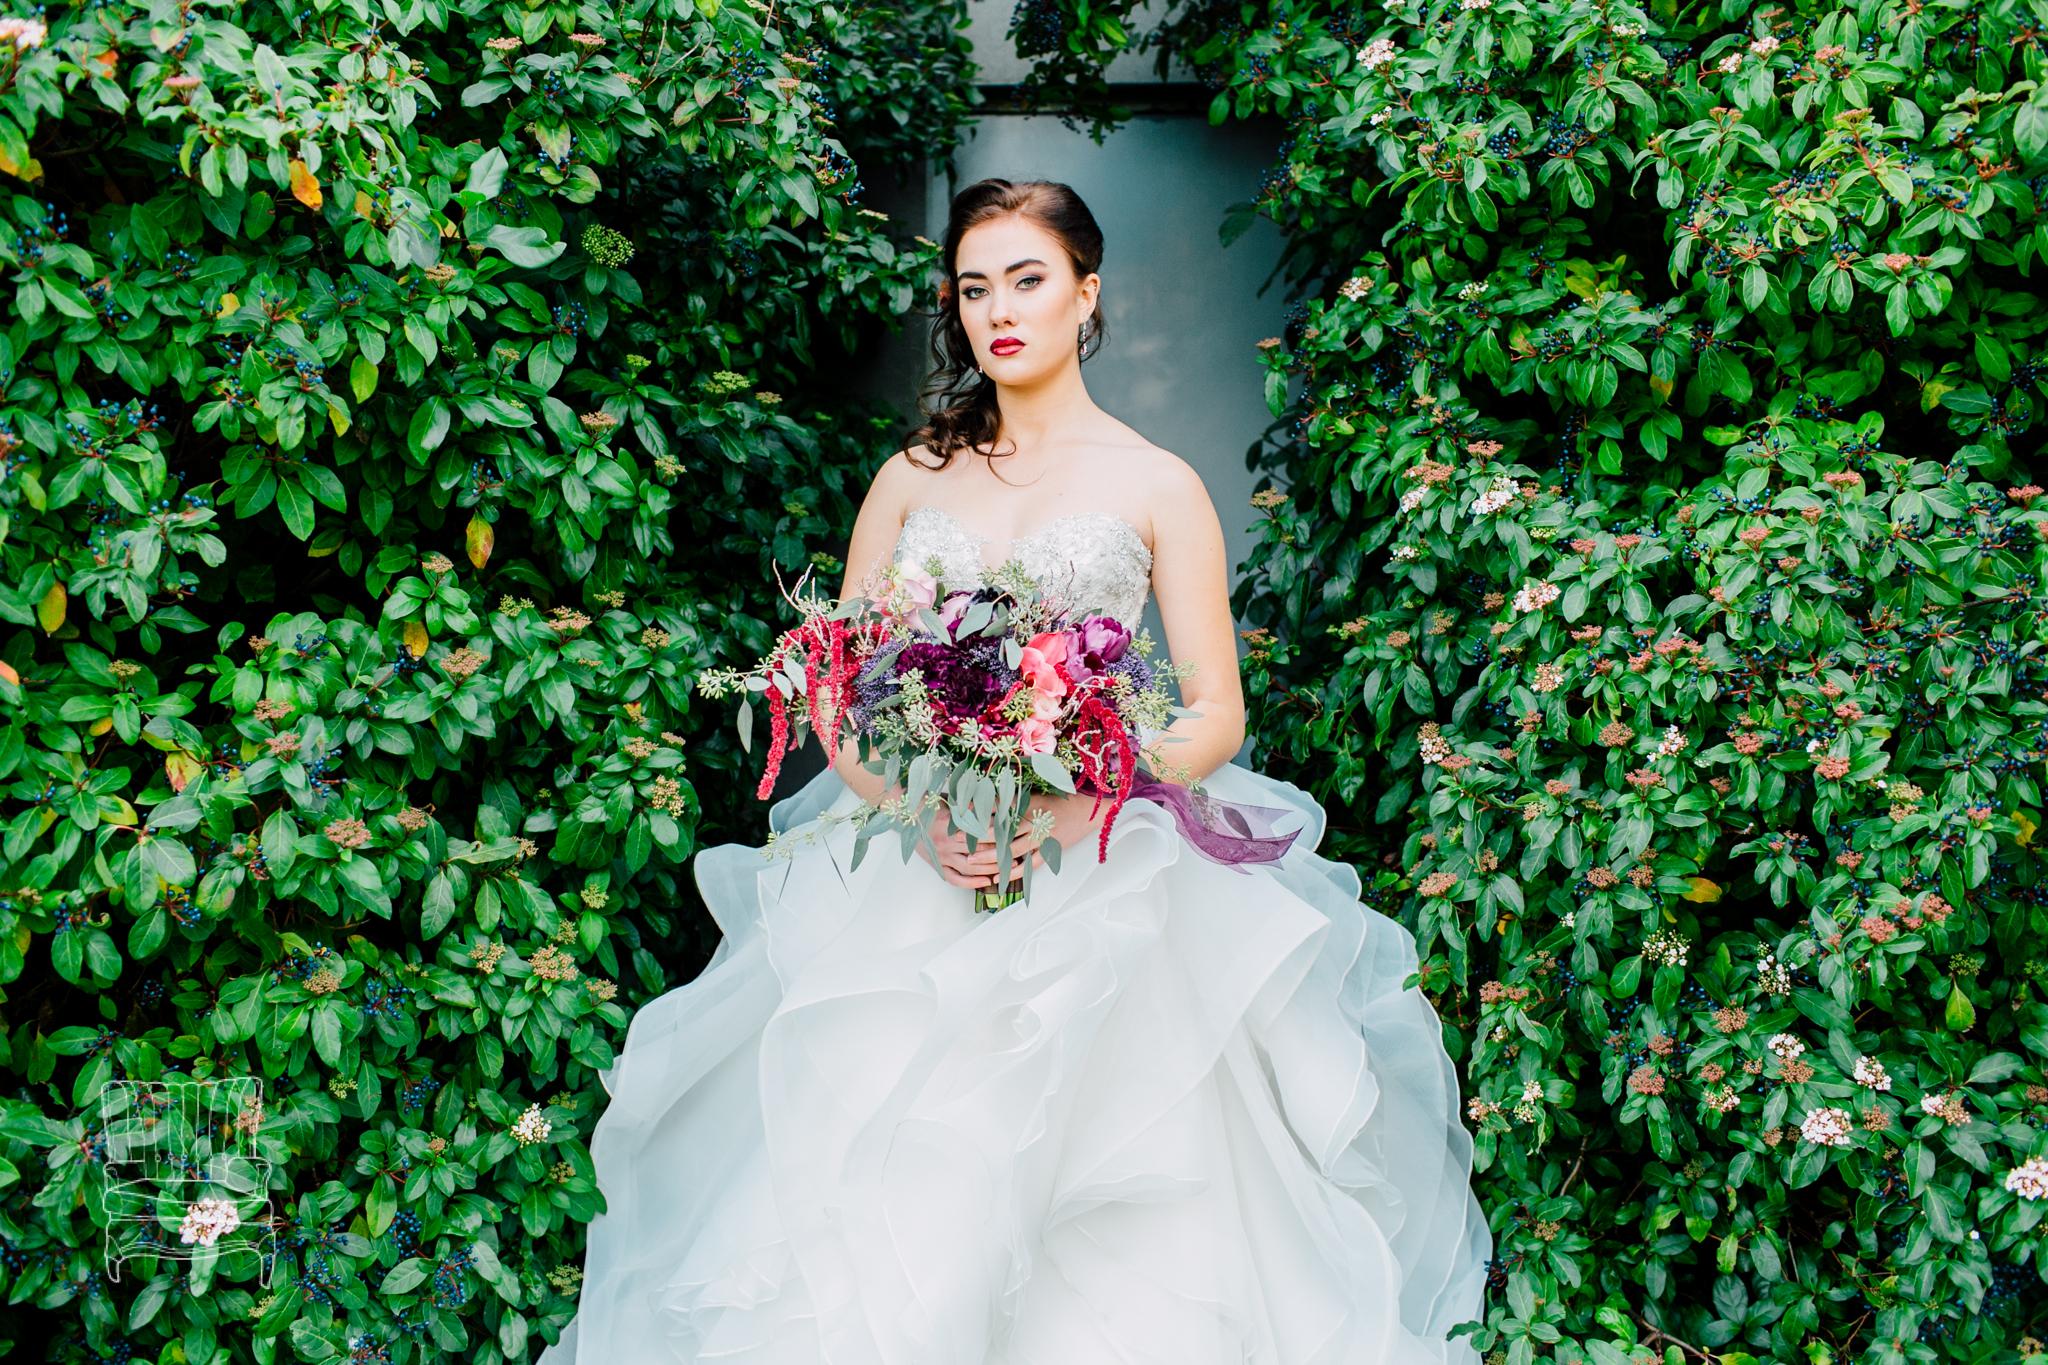 bellwether-hotel-bellingham-wedding-photographer-katheryn-moran-glitz-glam-styled-399.jpg